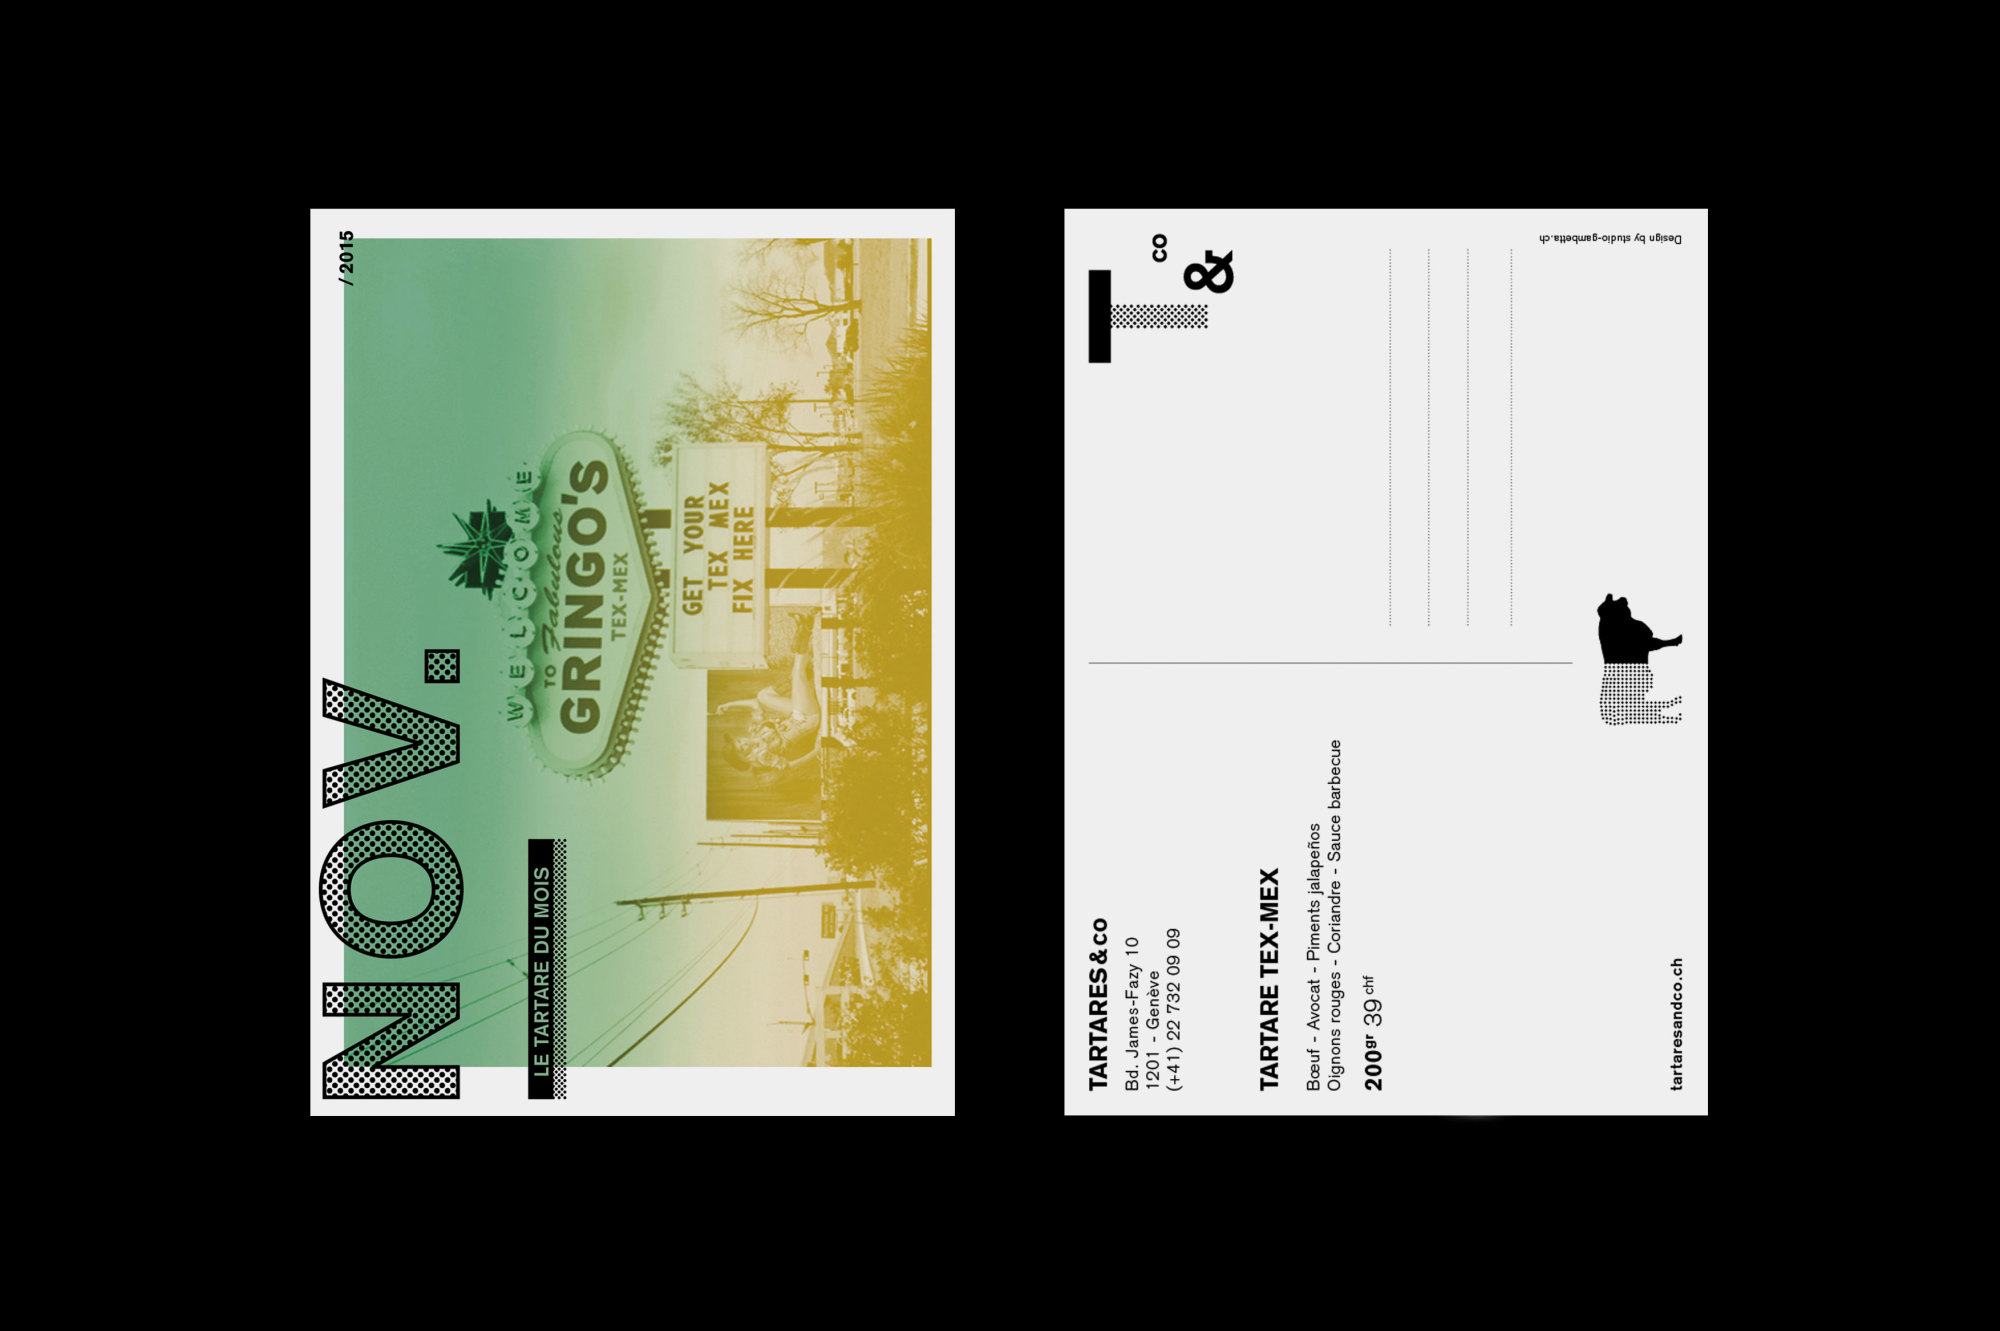 Graphisme Geneve graphic design graphique direction artistique tartares & co bar restaurant grand prix 2015 carte postale